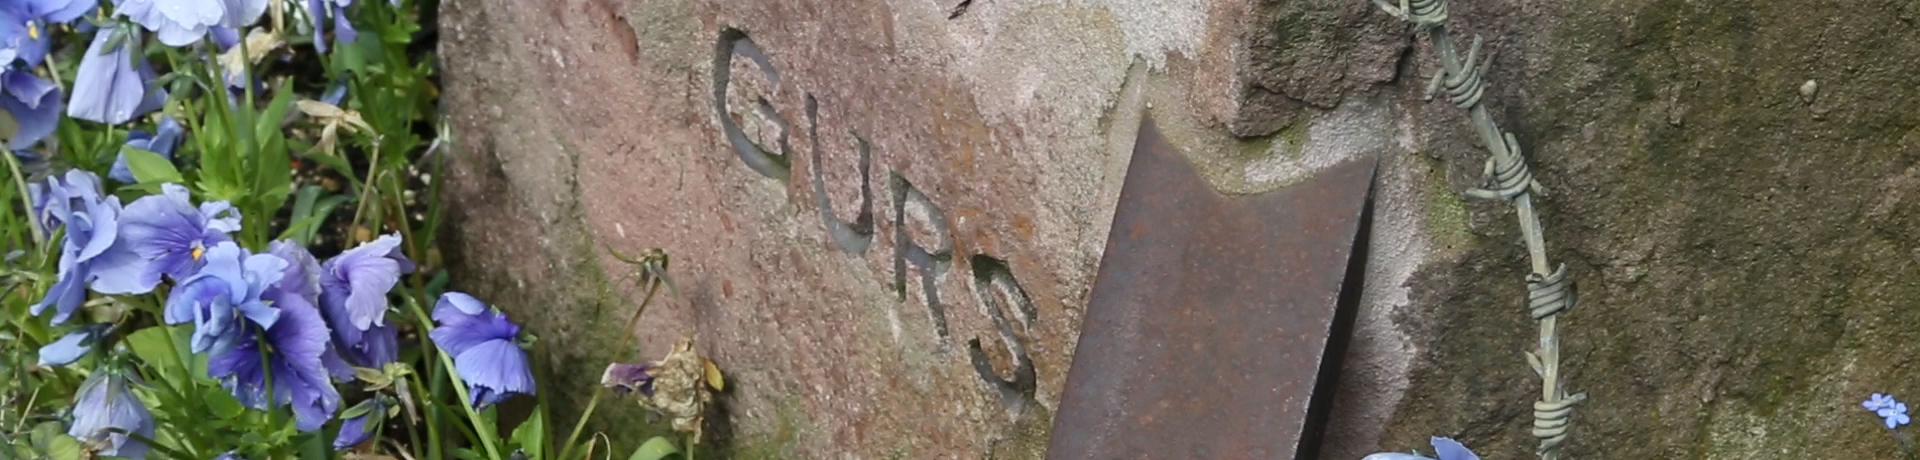 Gengenbach-Gedenkstein-Gurs